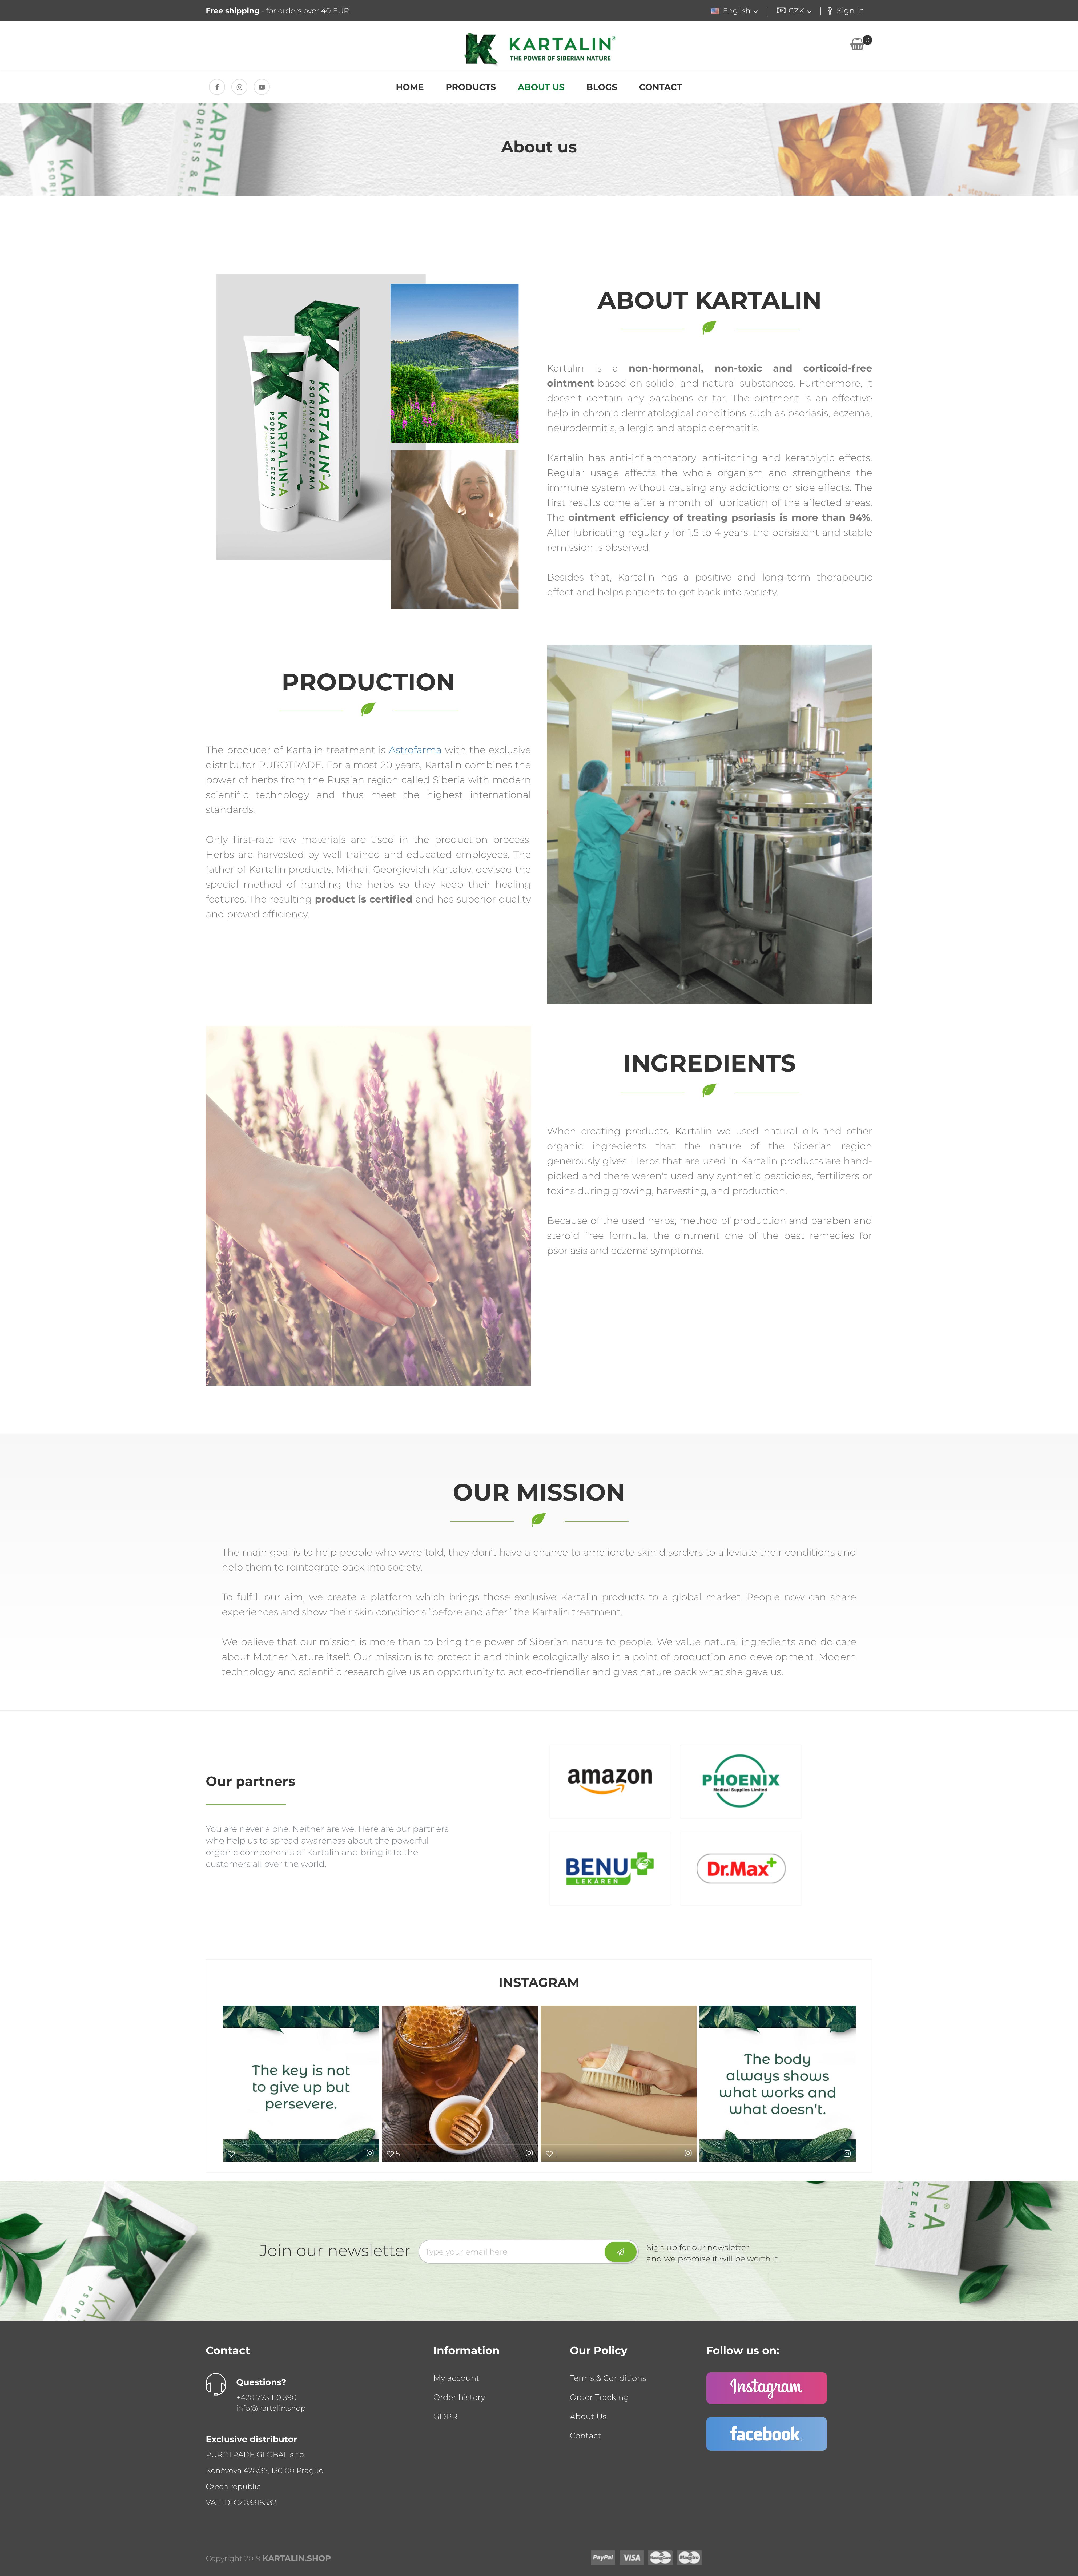 "Kartalin Shop - page ""About Us"""